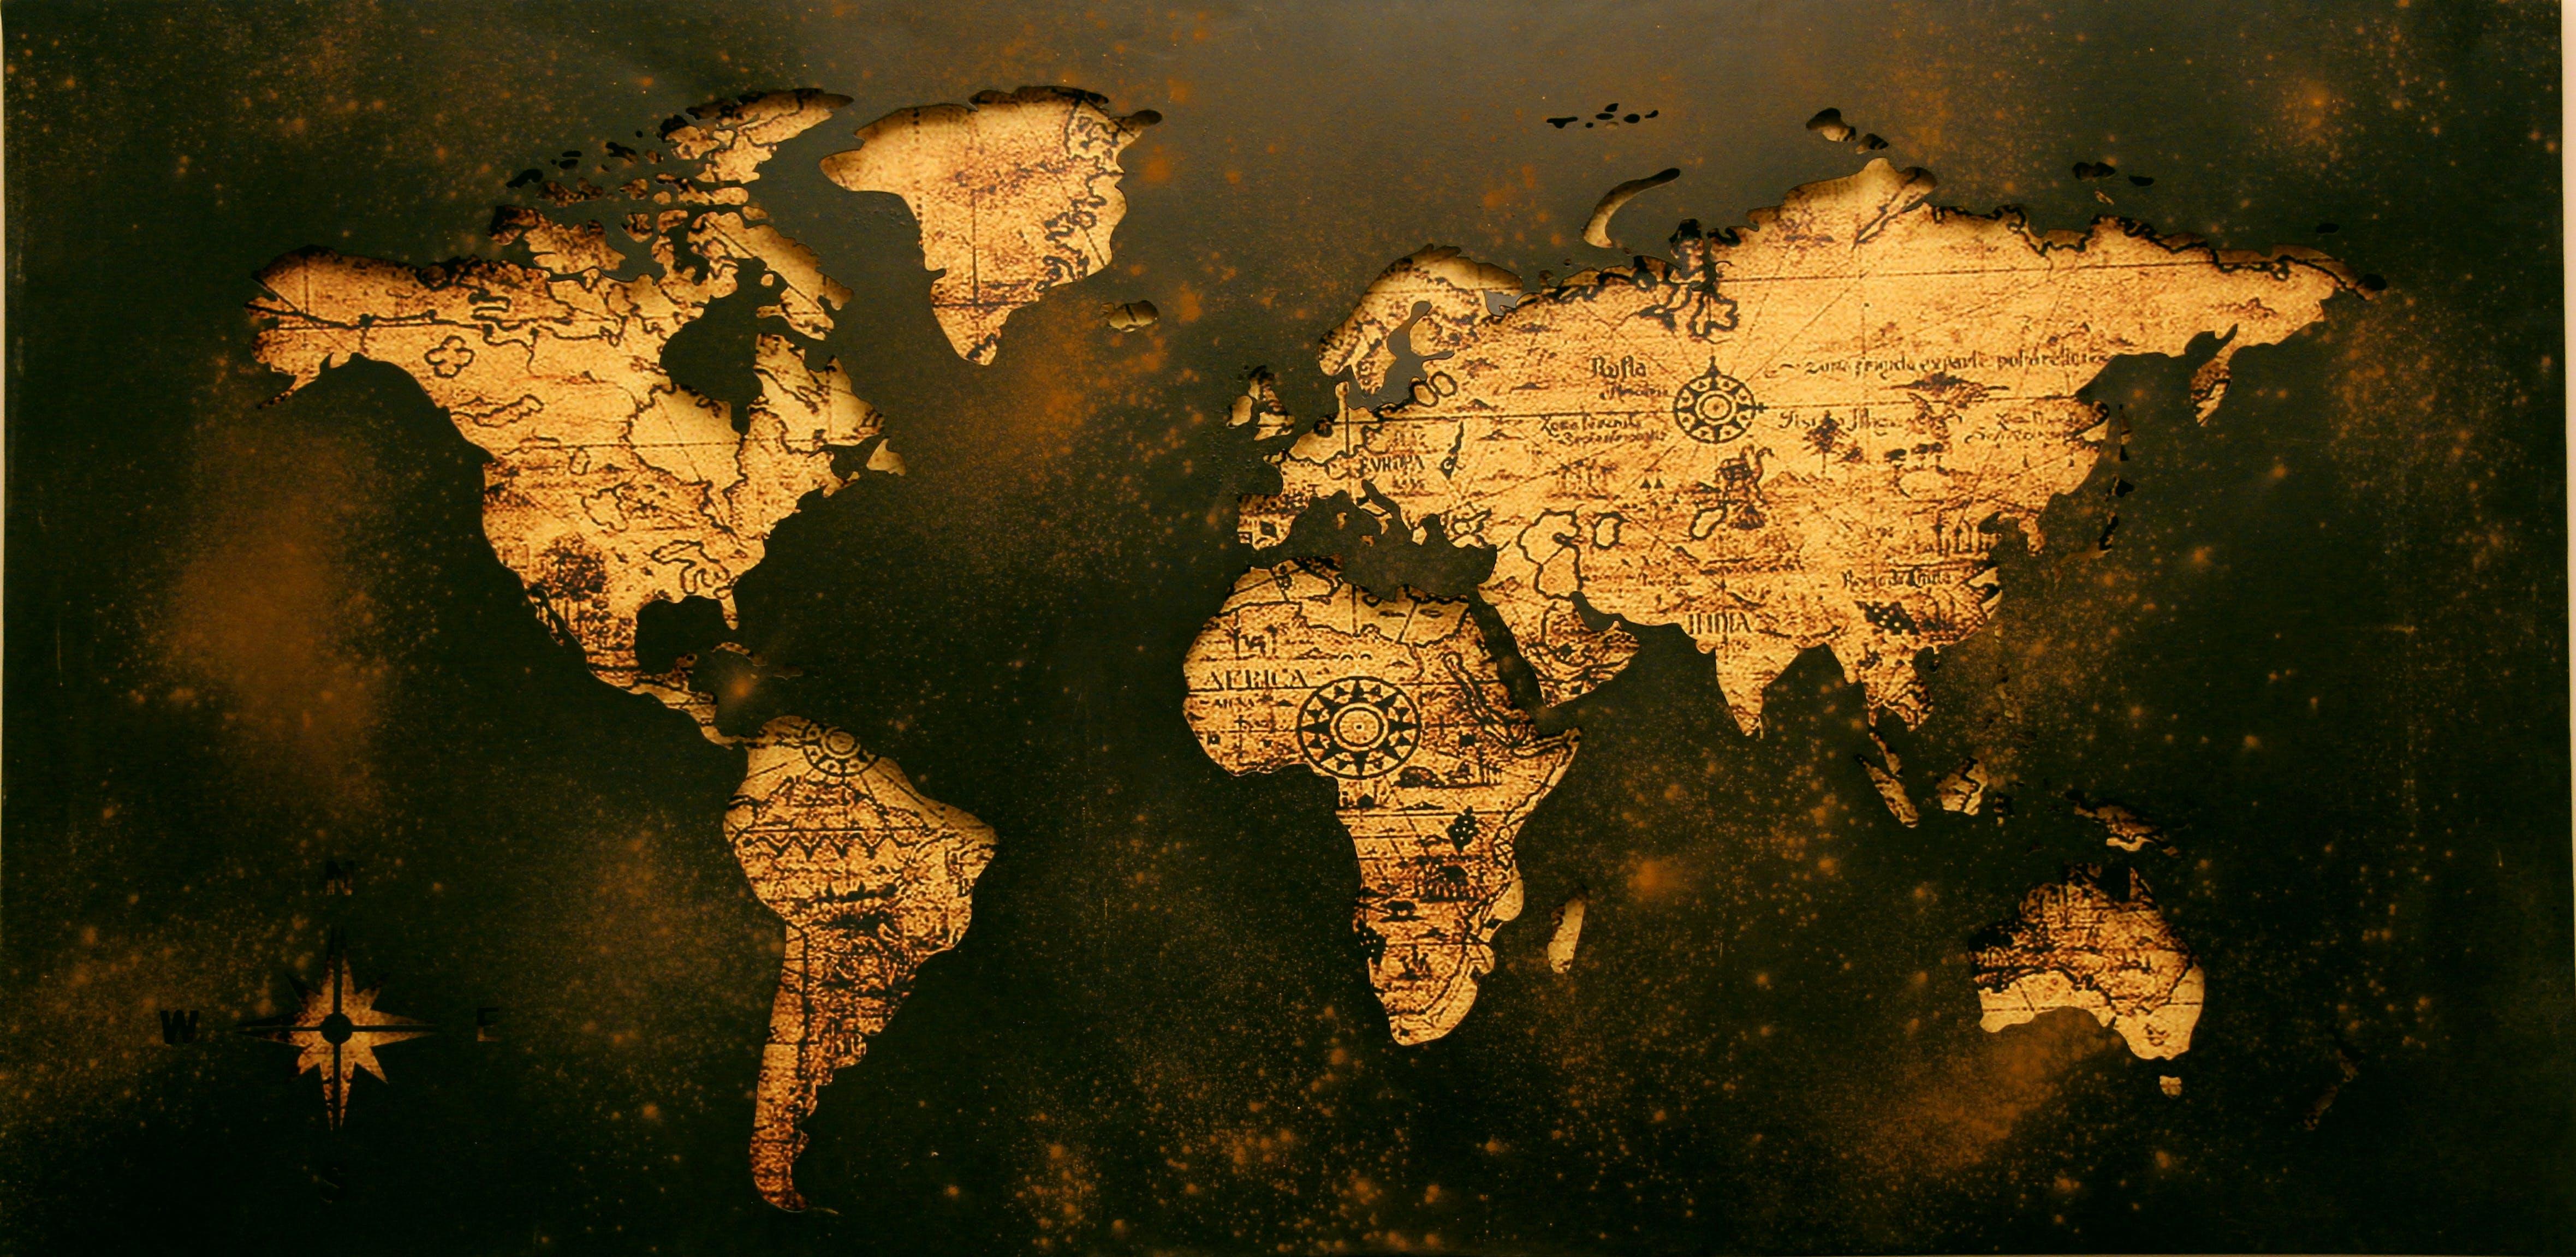 250+ Amazing World Map Photos · Pexels · Free Stock Photos